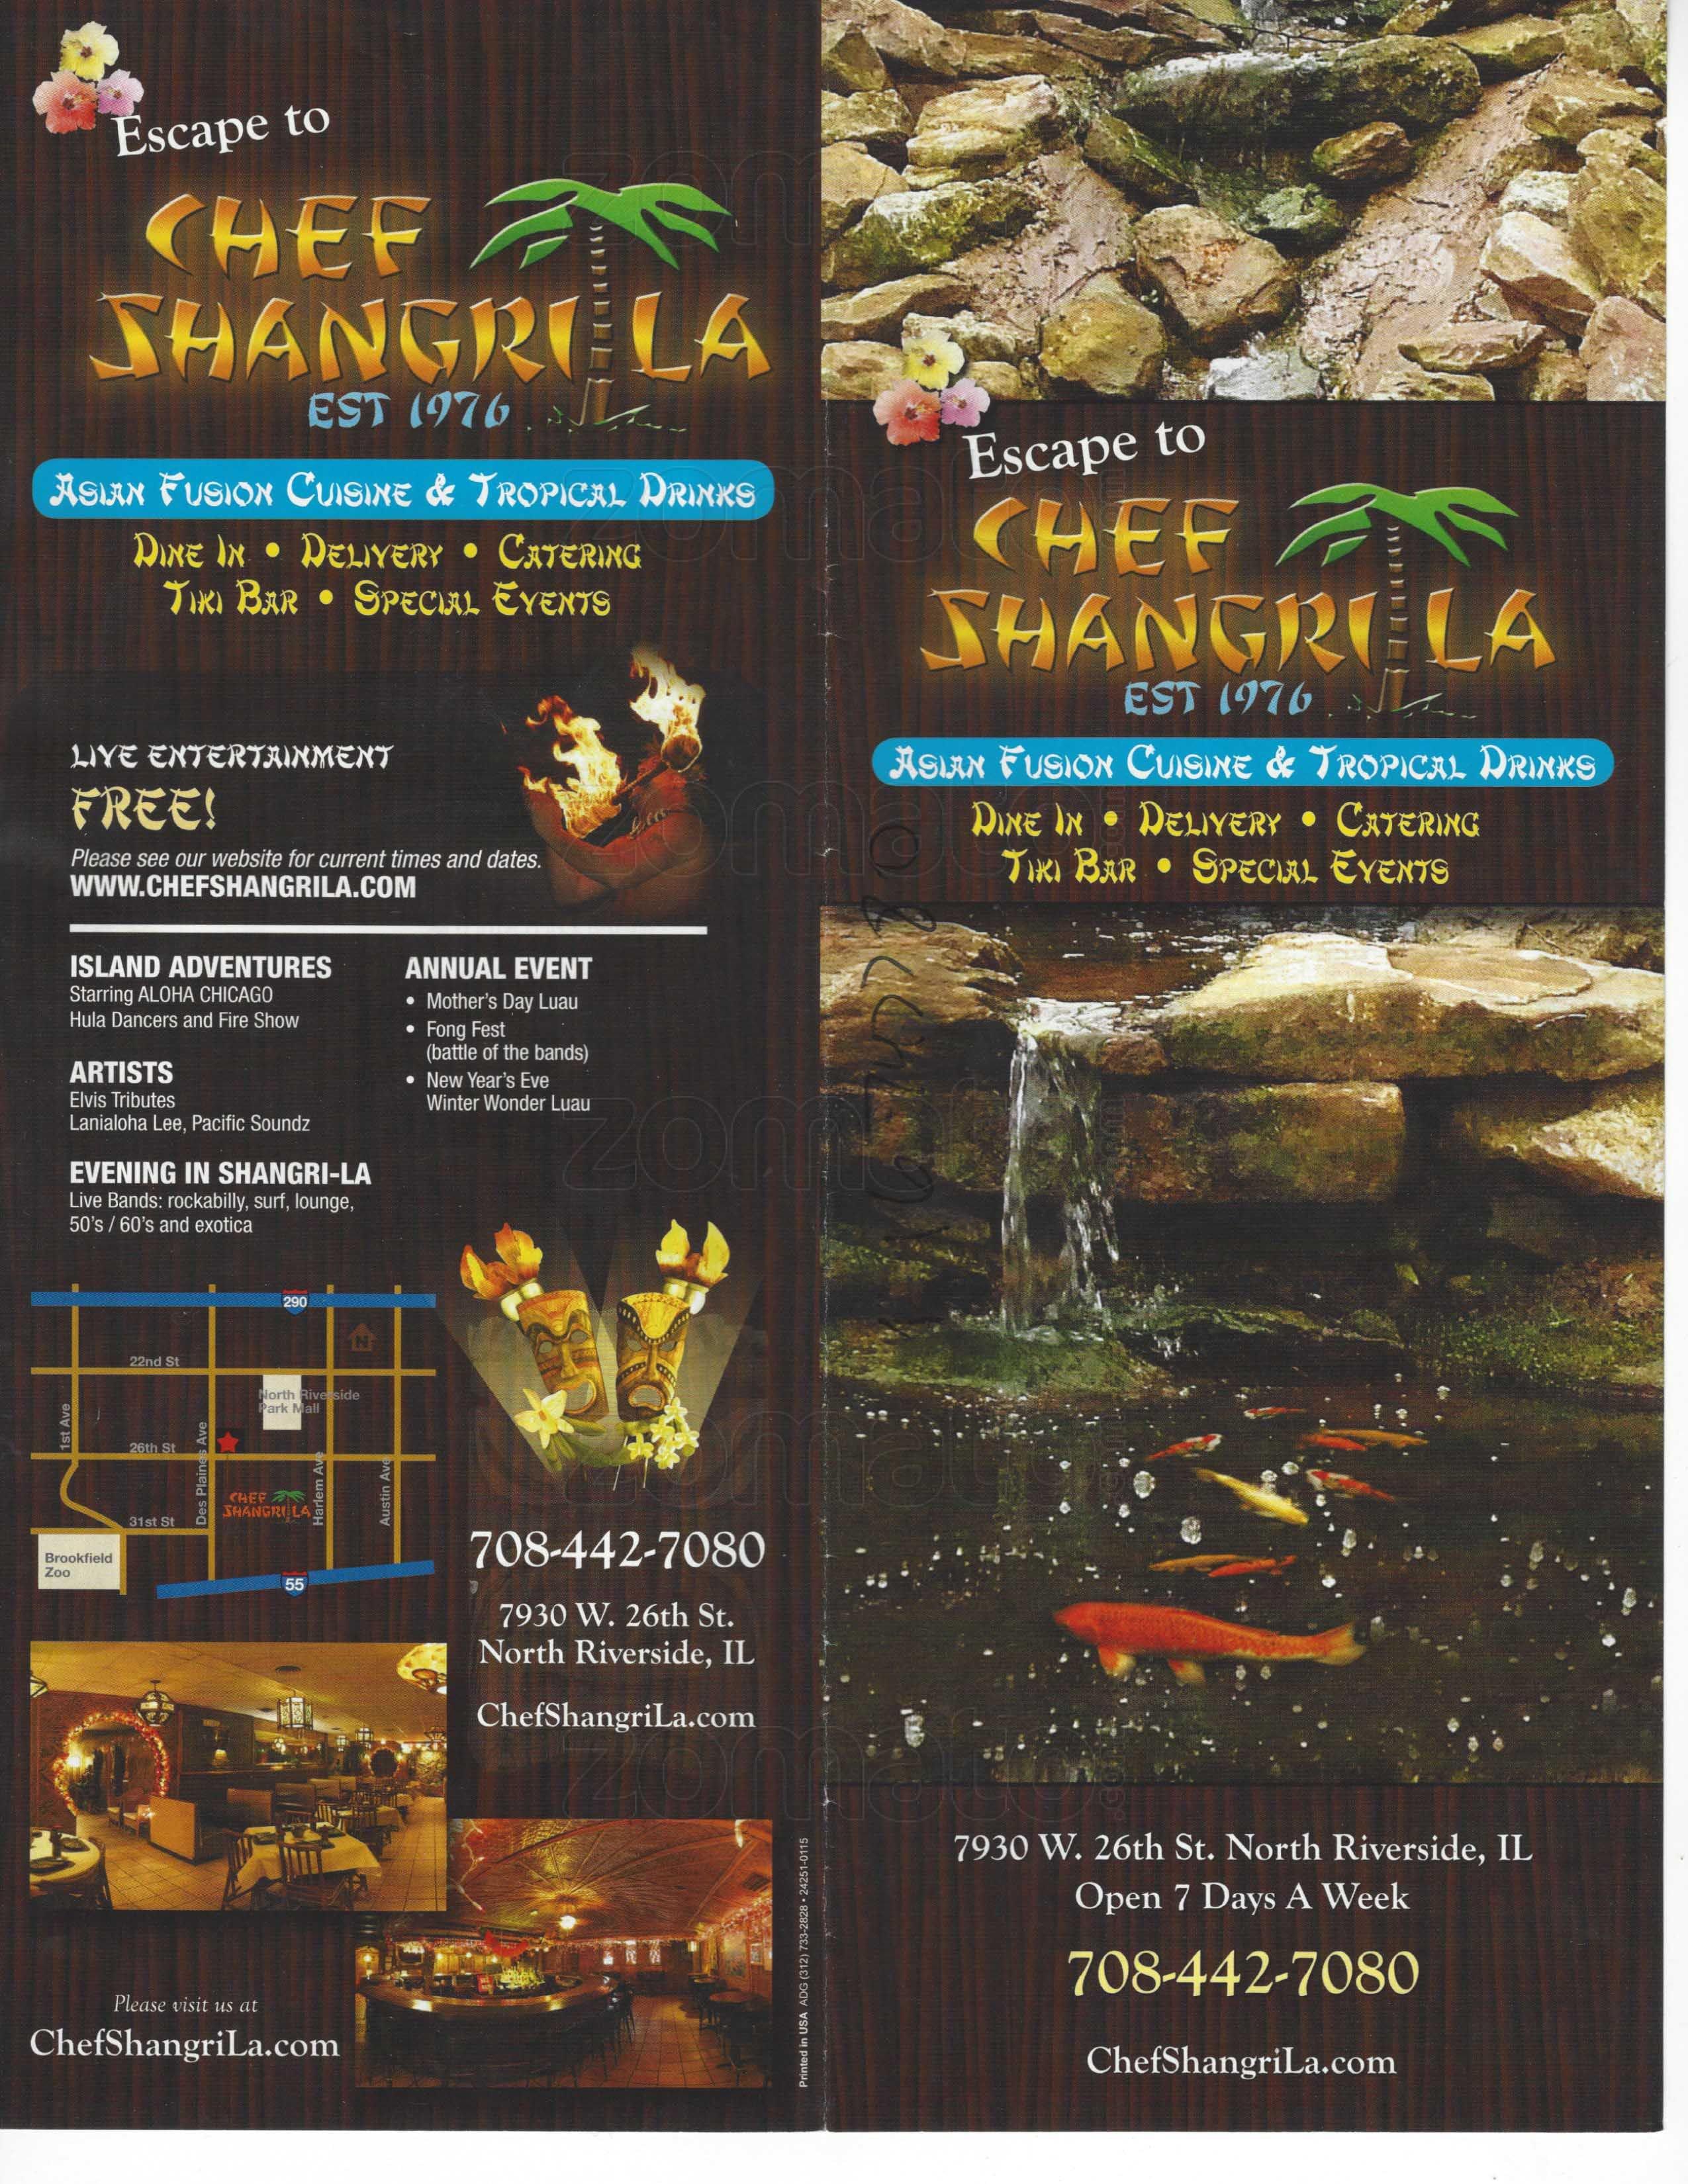 Chef Shangri-La Menu, Menu for Chef Shangri-La, North Riverside ...